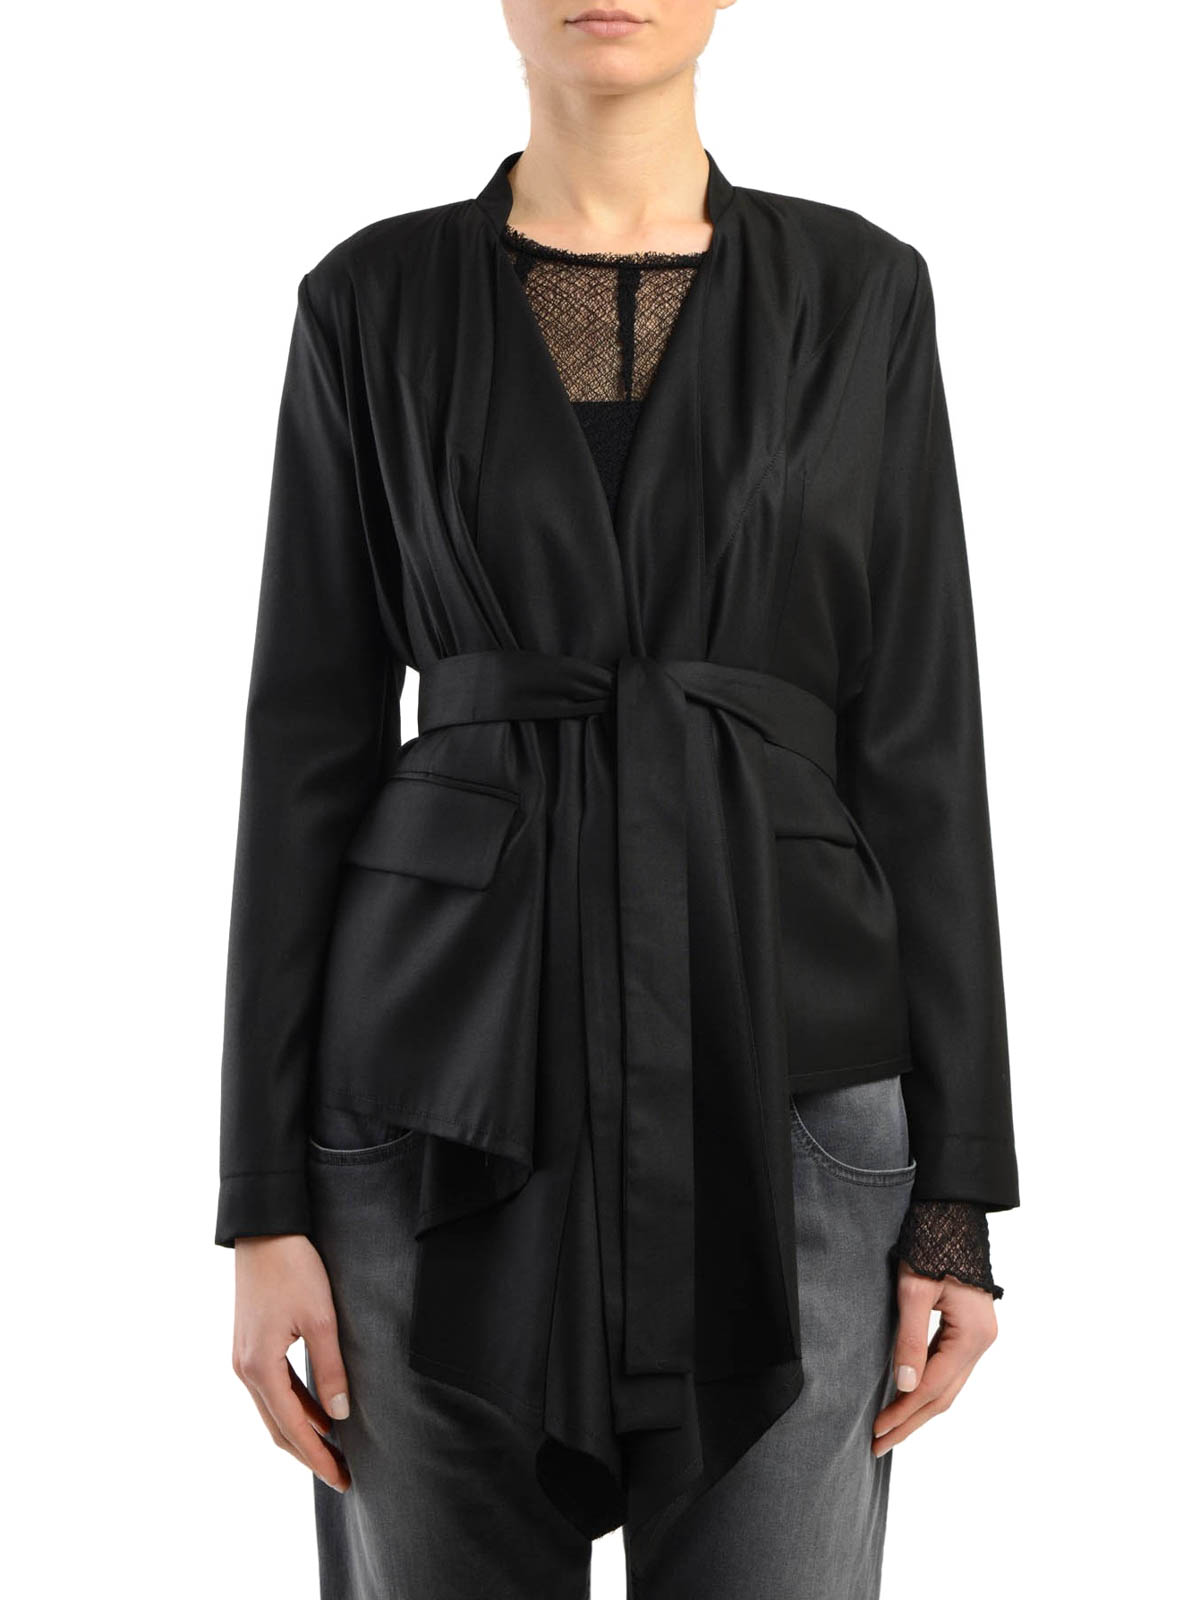 catalog product draped trench drape jacket shop coats contemporary forever eu front outerwear drapes